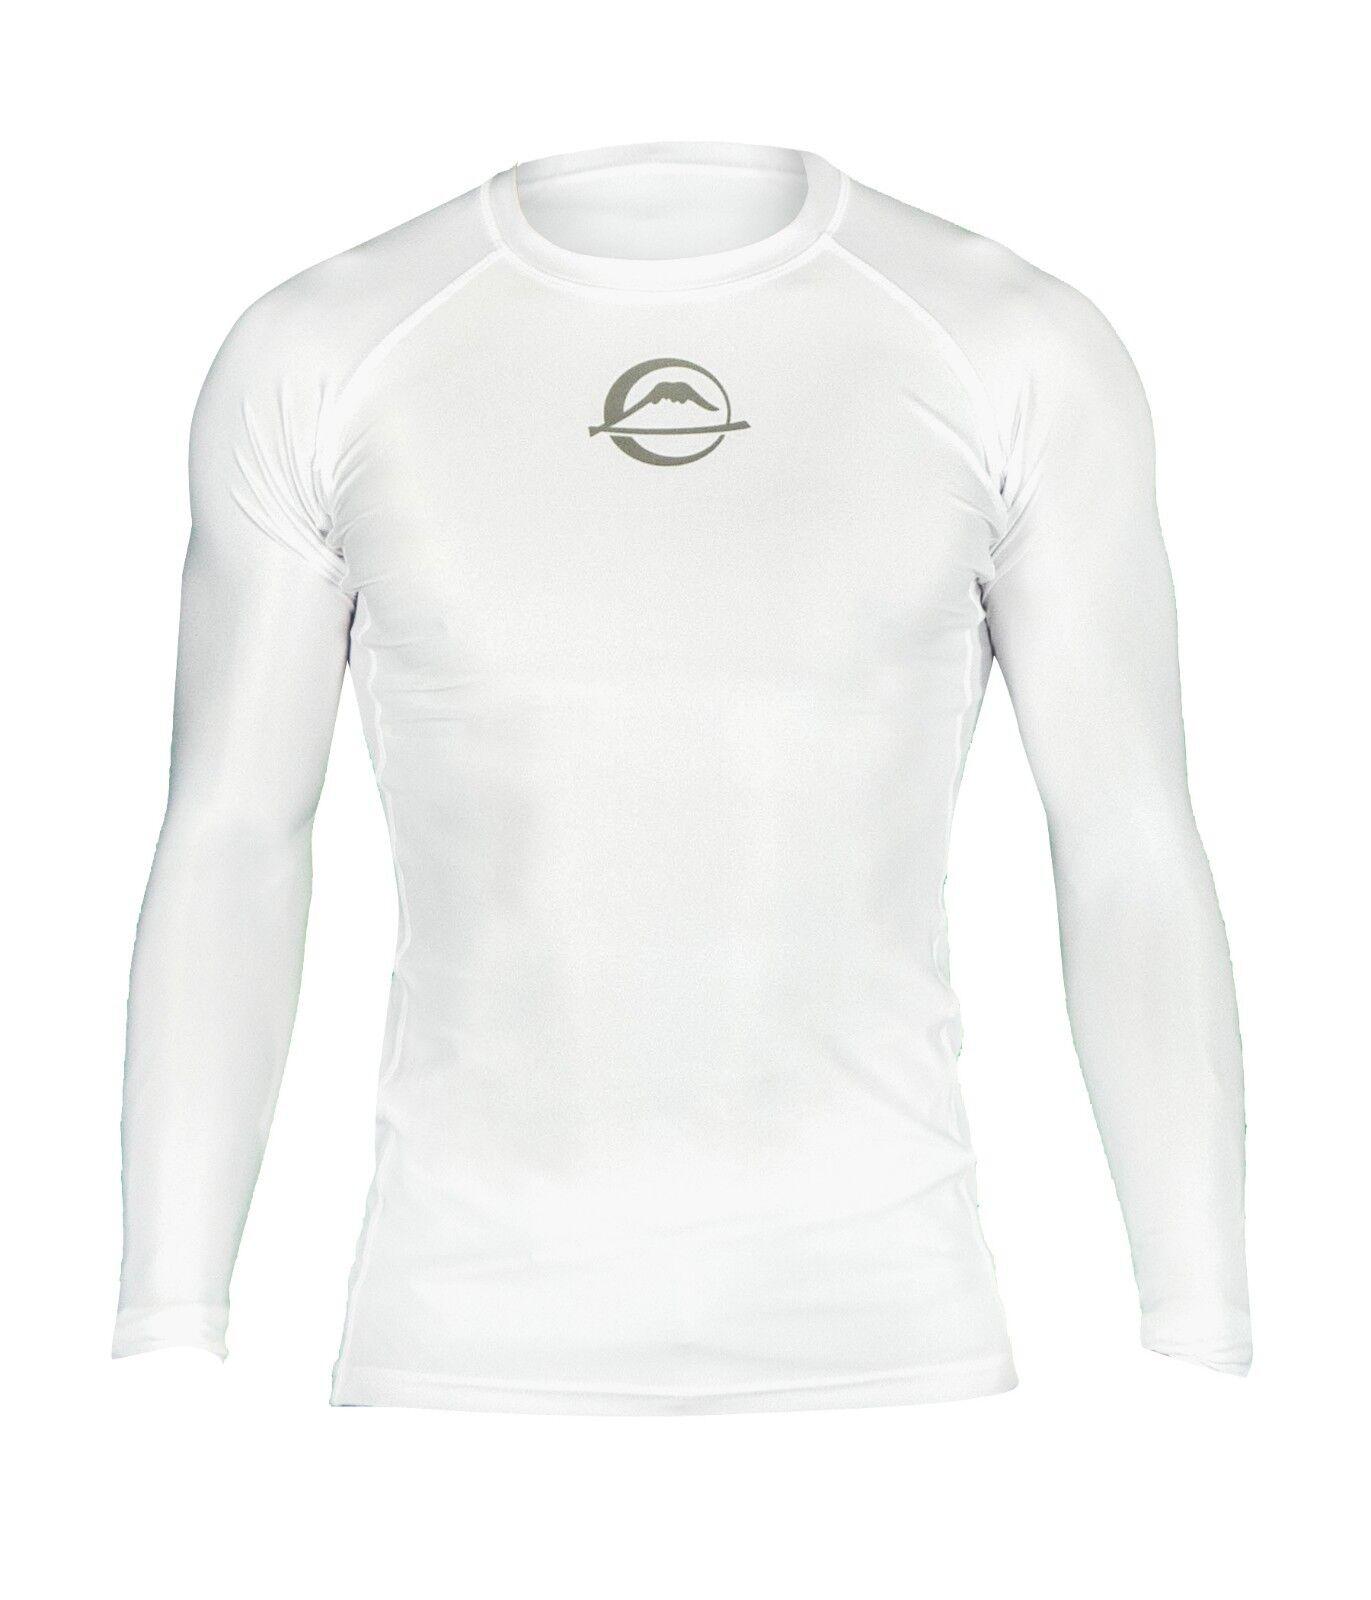 Fuji Sports Baseline IBJJF Ranked BJJ Jiu Jitsu Long Sleeve LS Rashguard - White